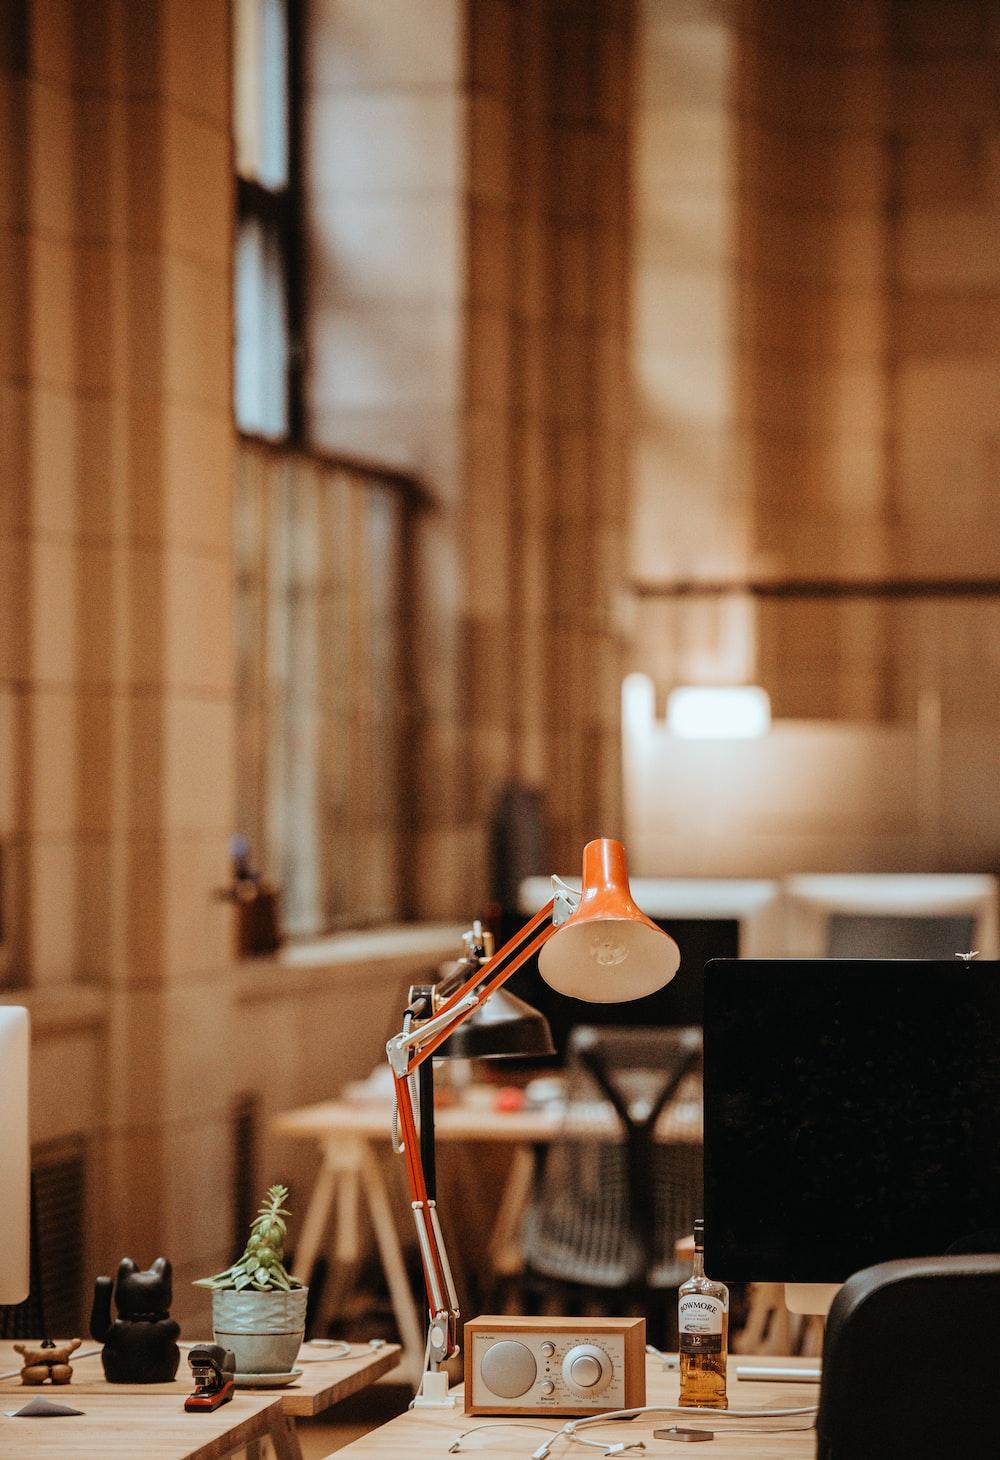 brown desk lamp beside computer monitor on desk